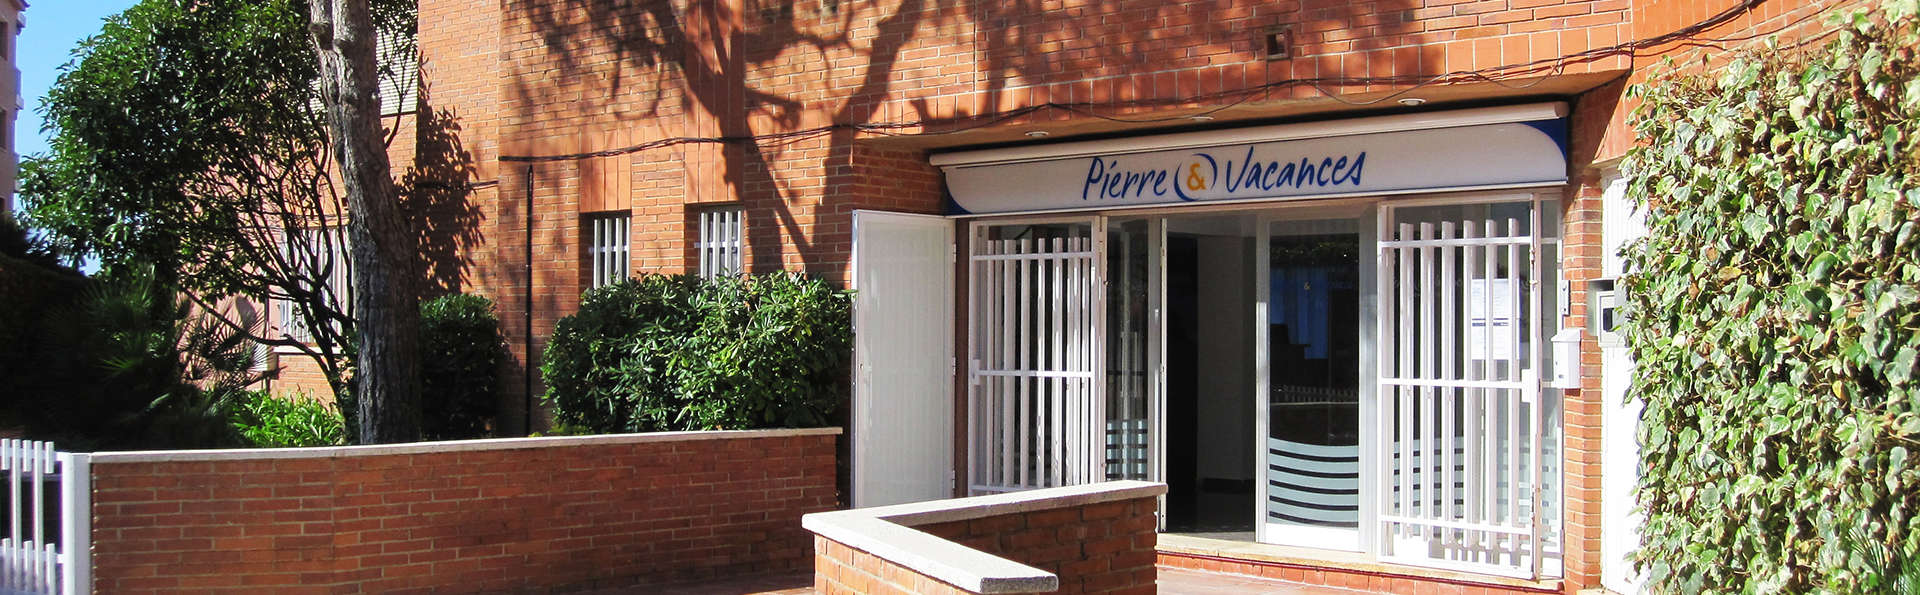 Pierre & Vacances Comarruga - Edit_Front.jpg